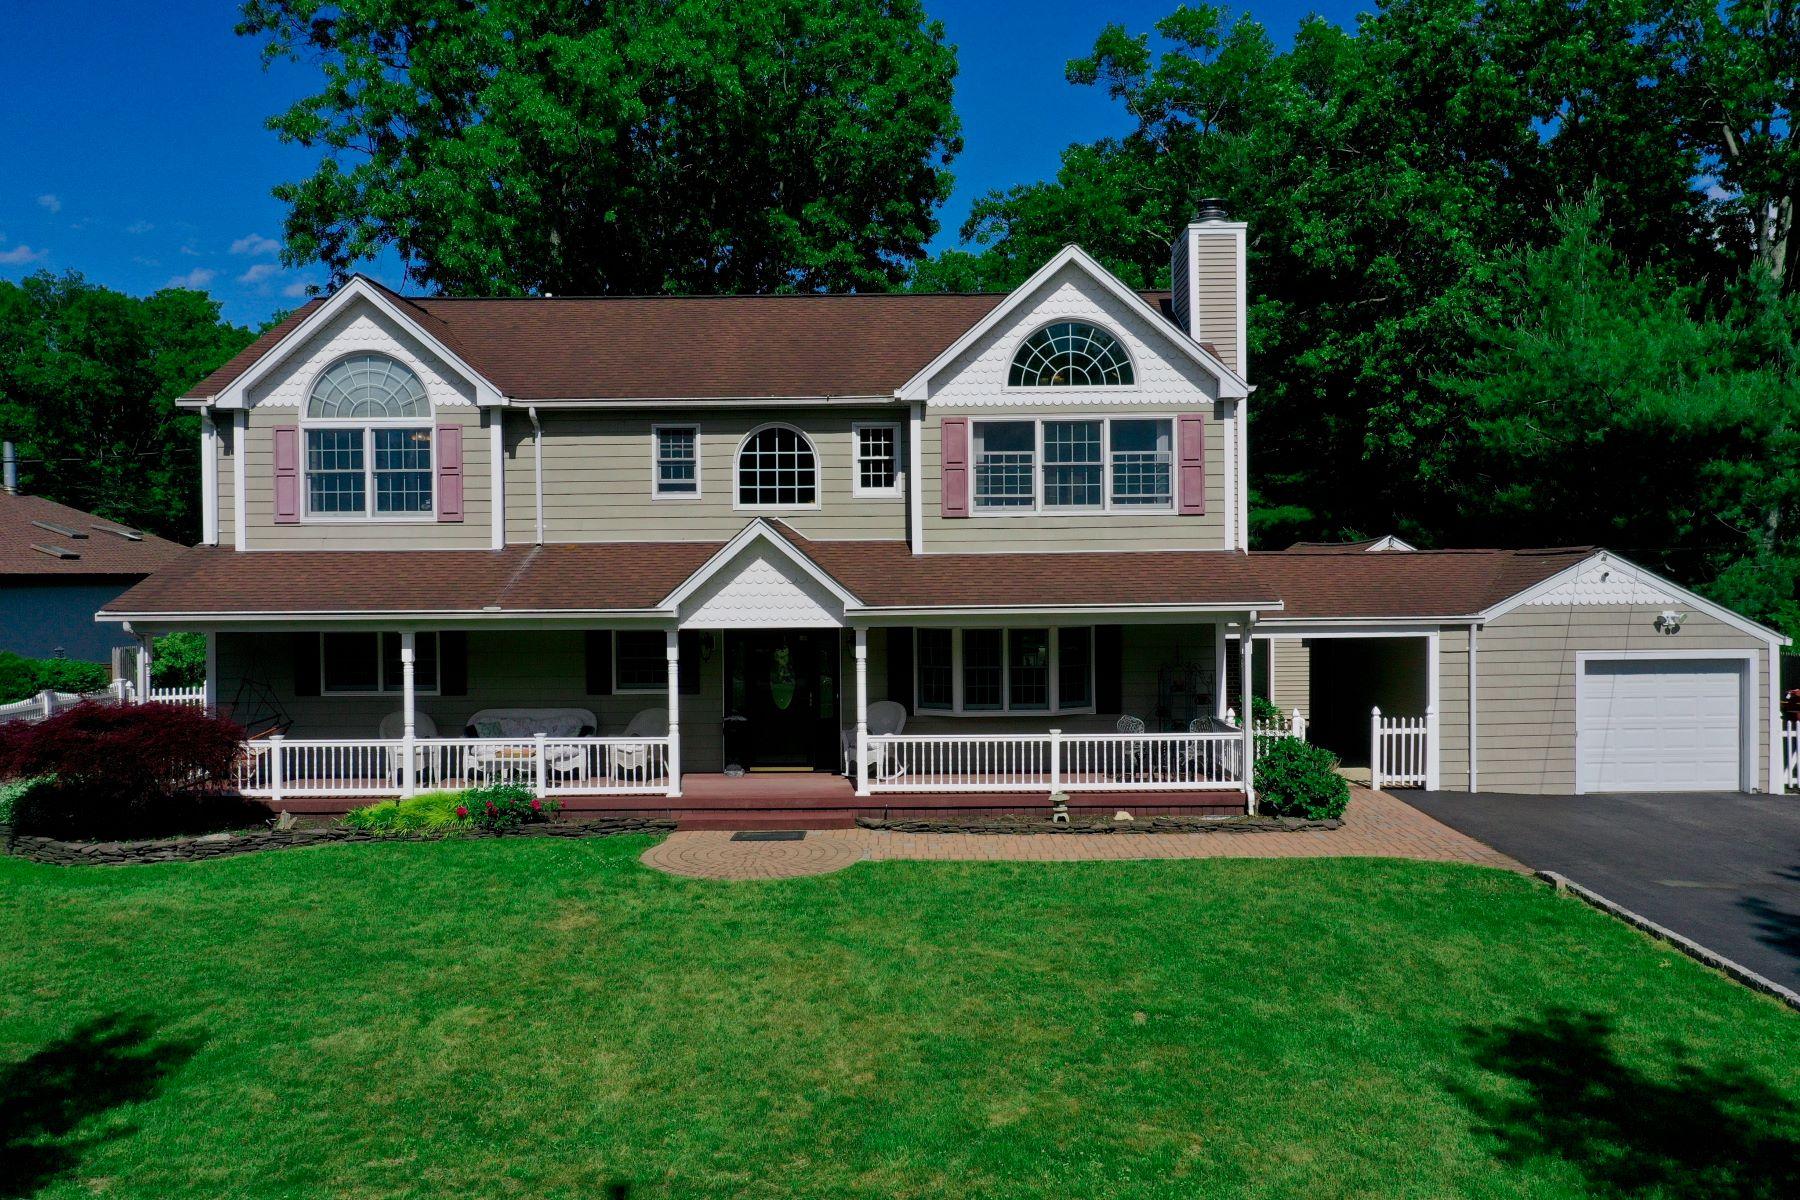 Single Family Homes for Active at Smithtown 23 Winston Smithtown, New York 11787 United States